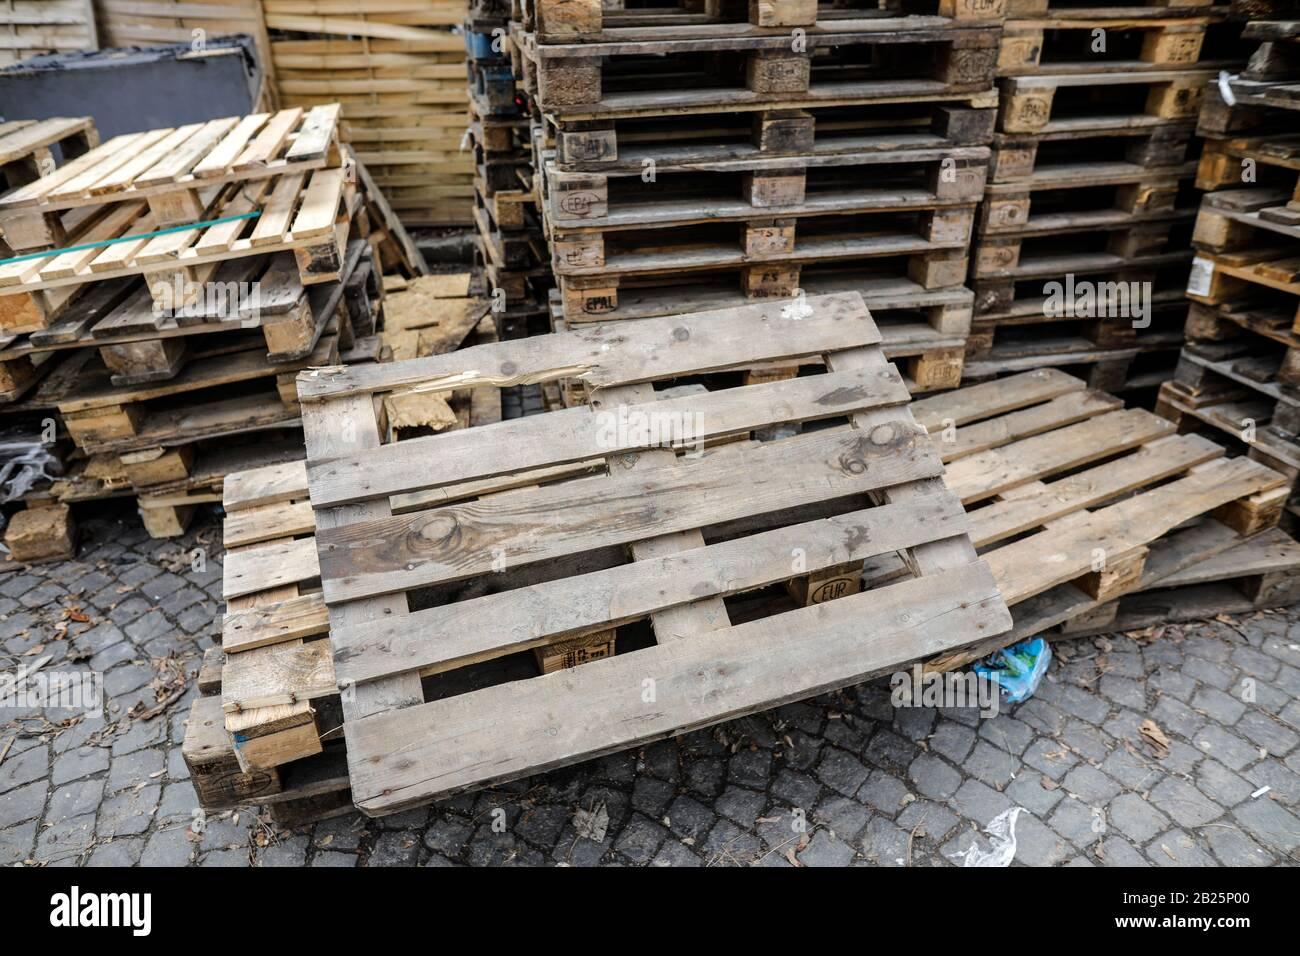 Eur Pallets Immagini E Fotos Stock Alamy